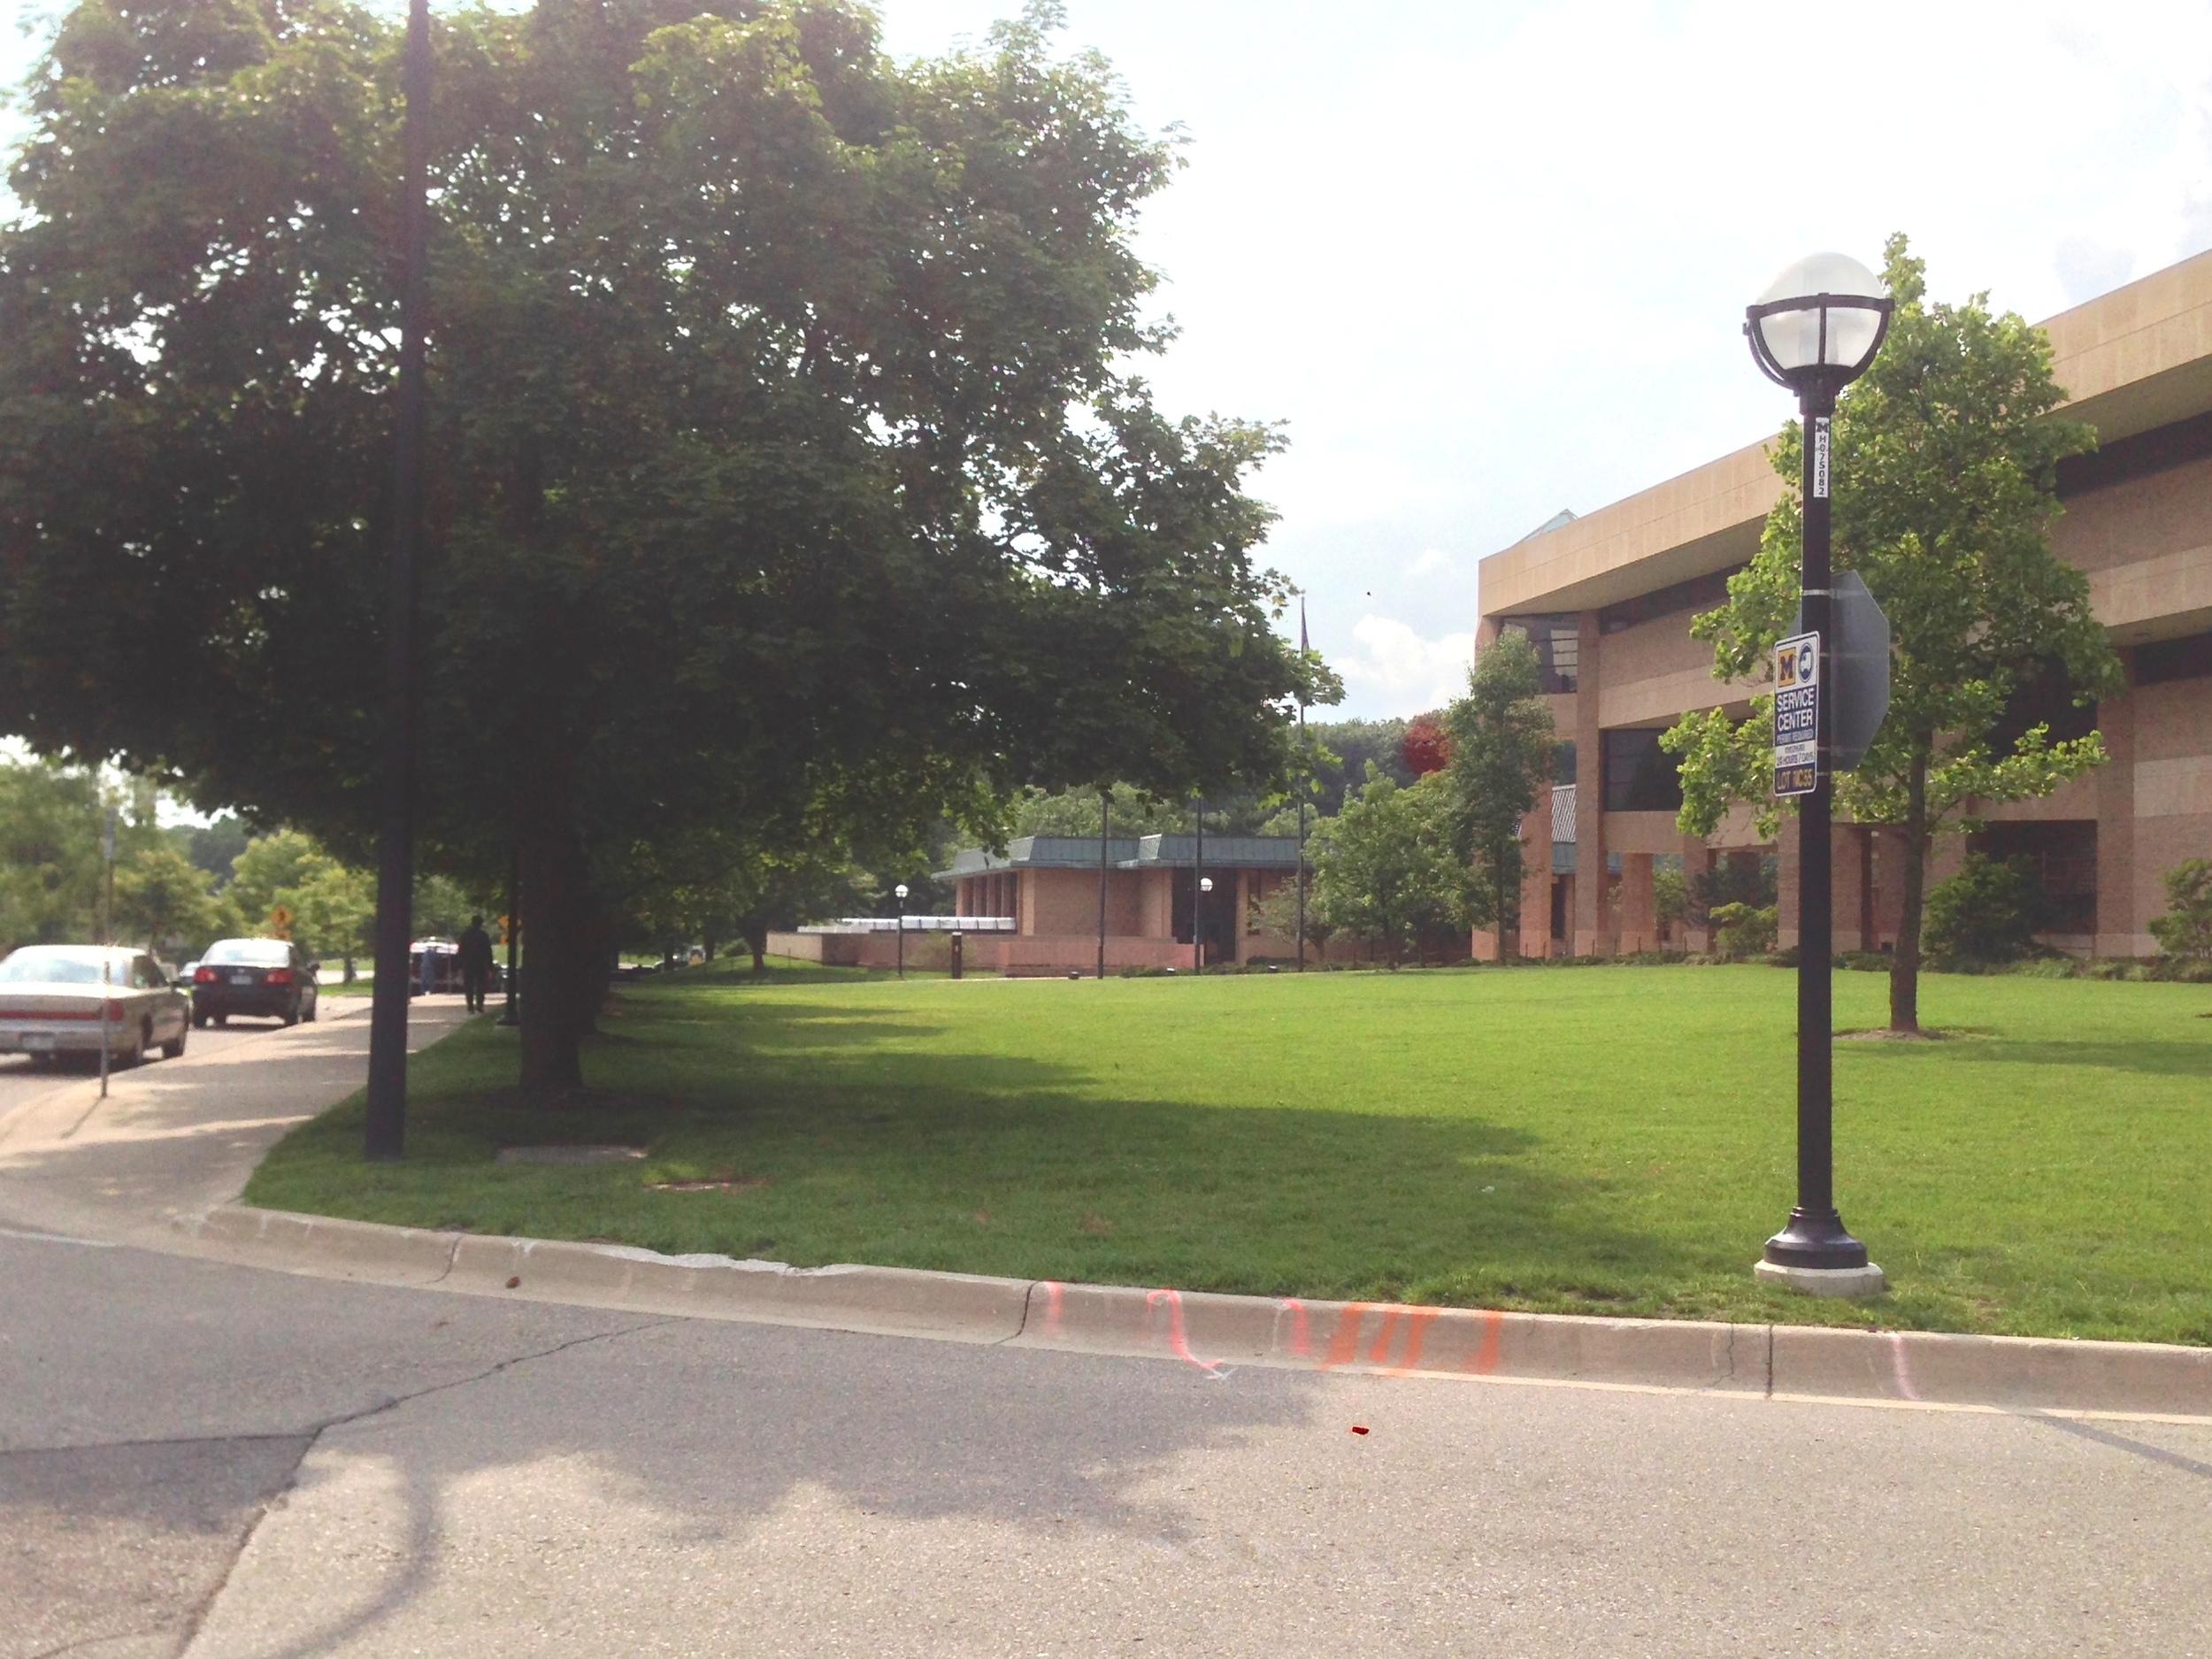 Michigan's north campus